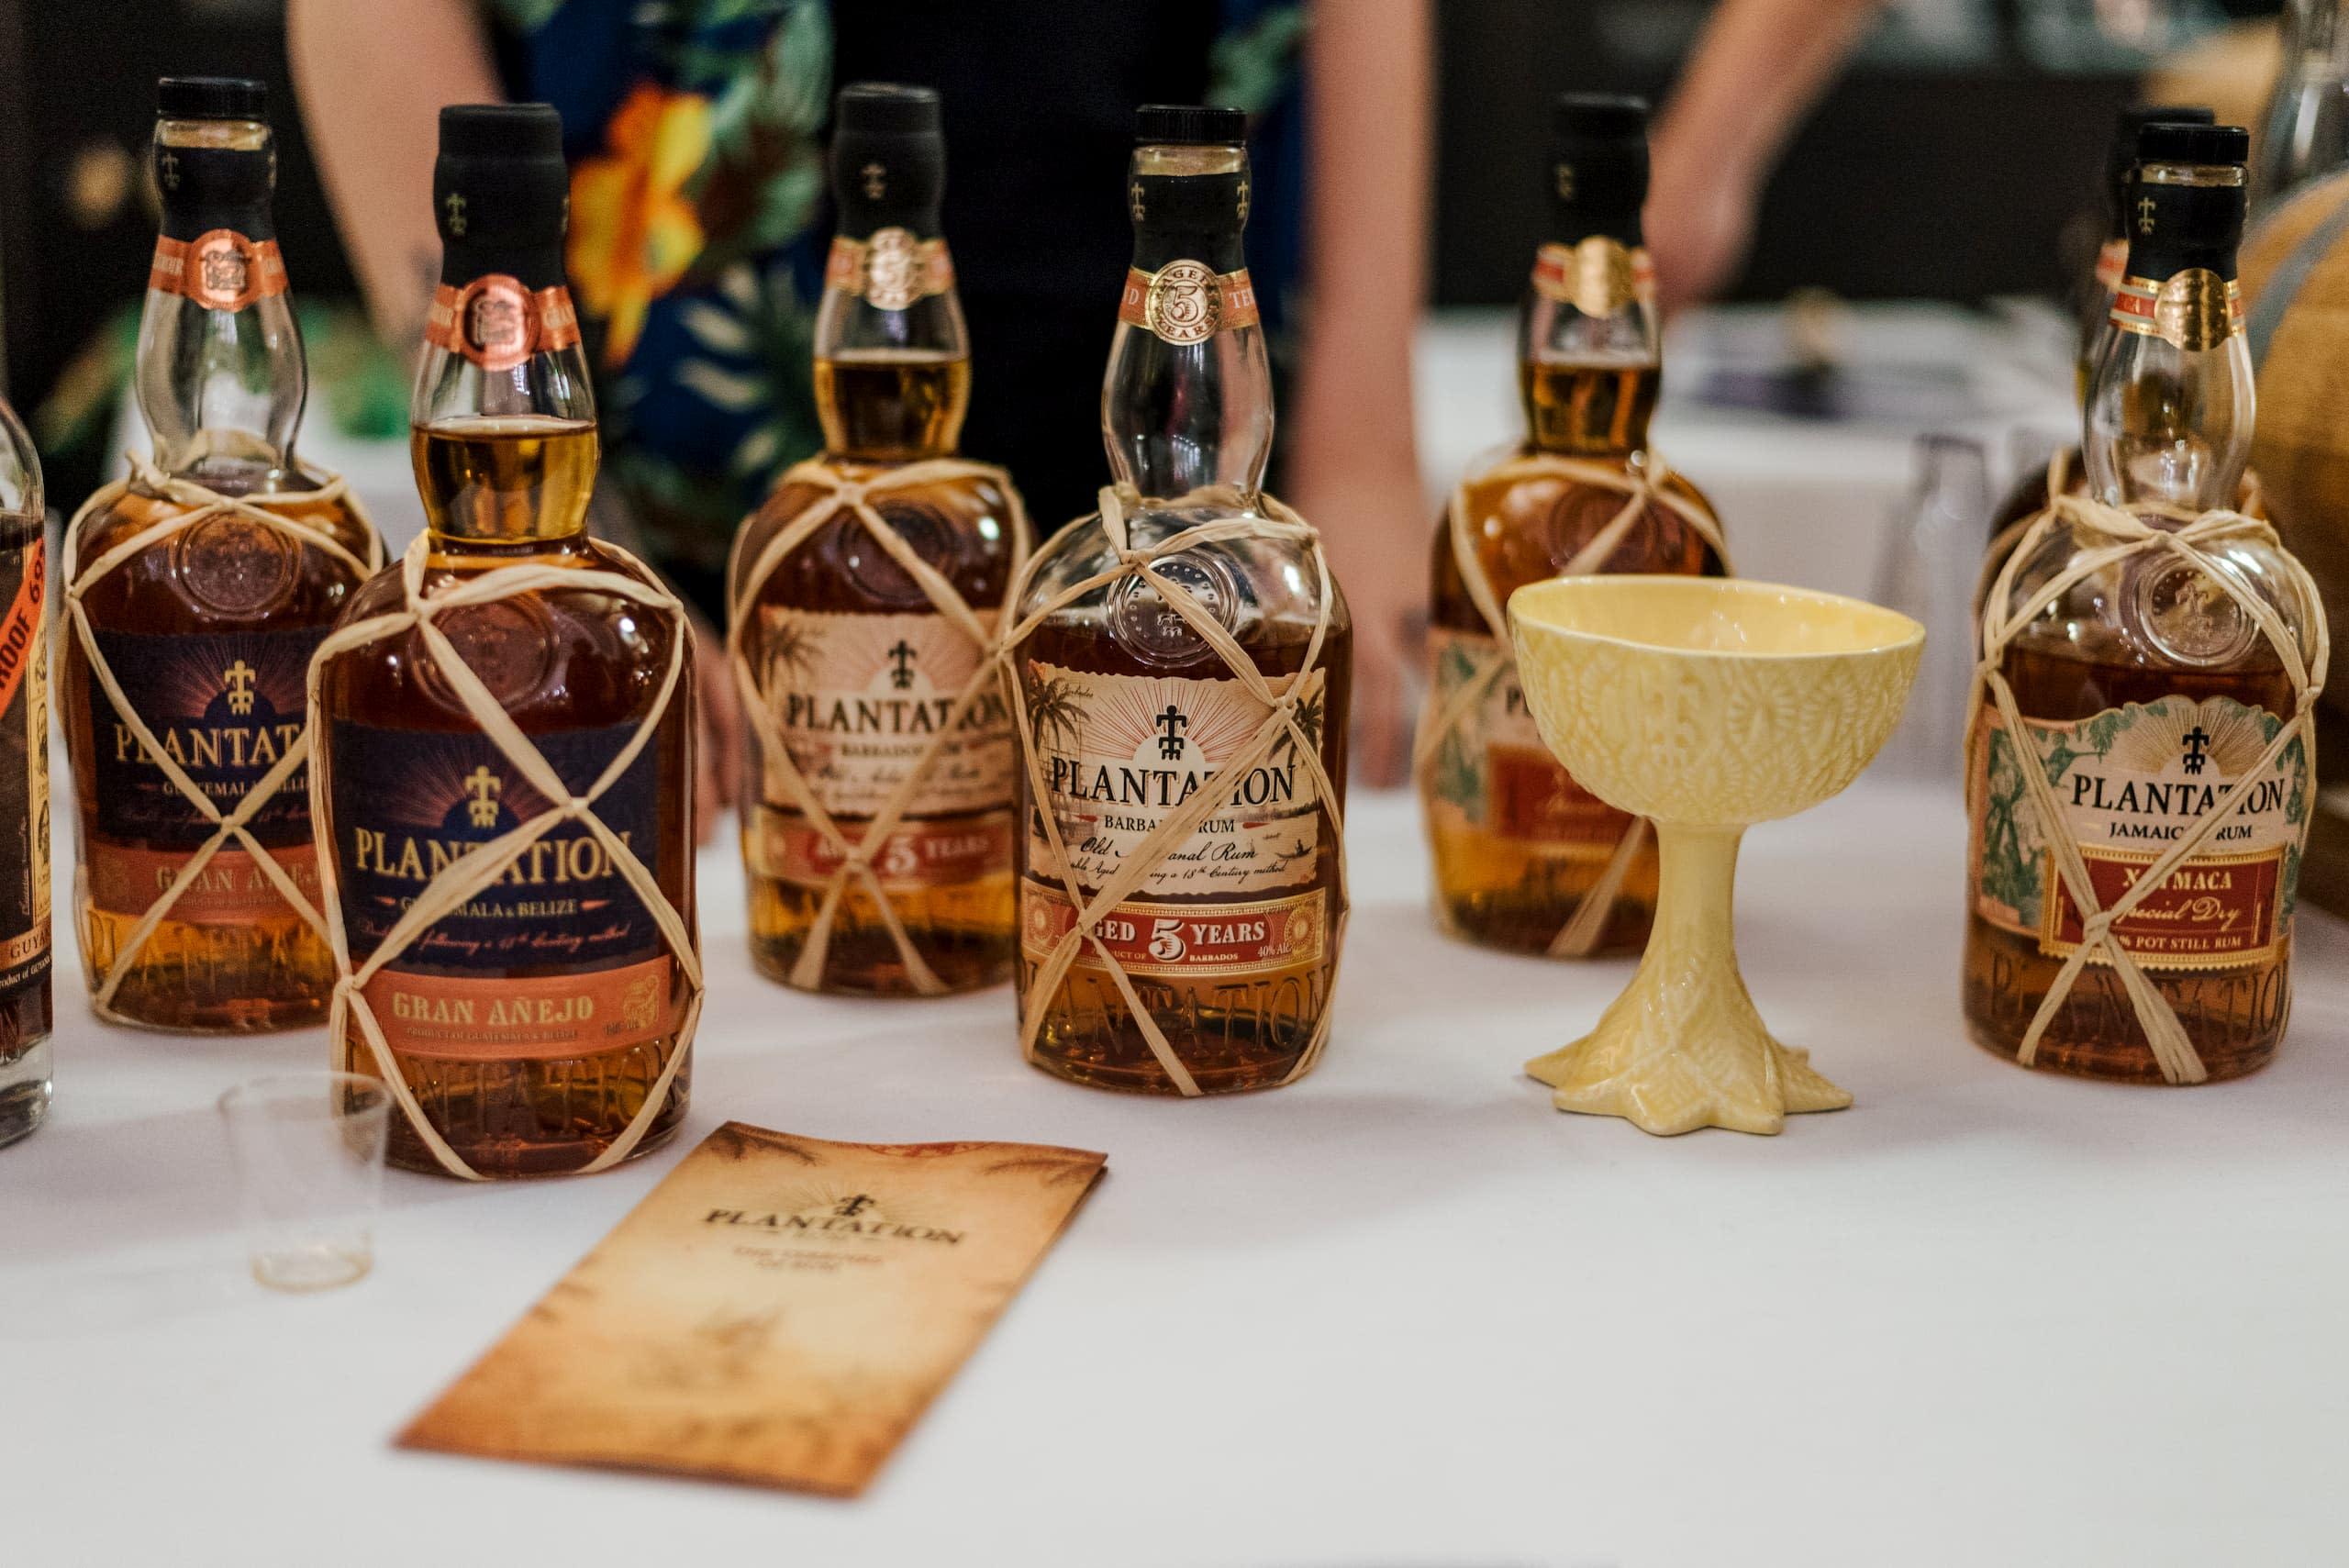 Plantation Rum Sip Along